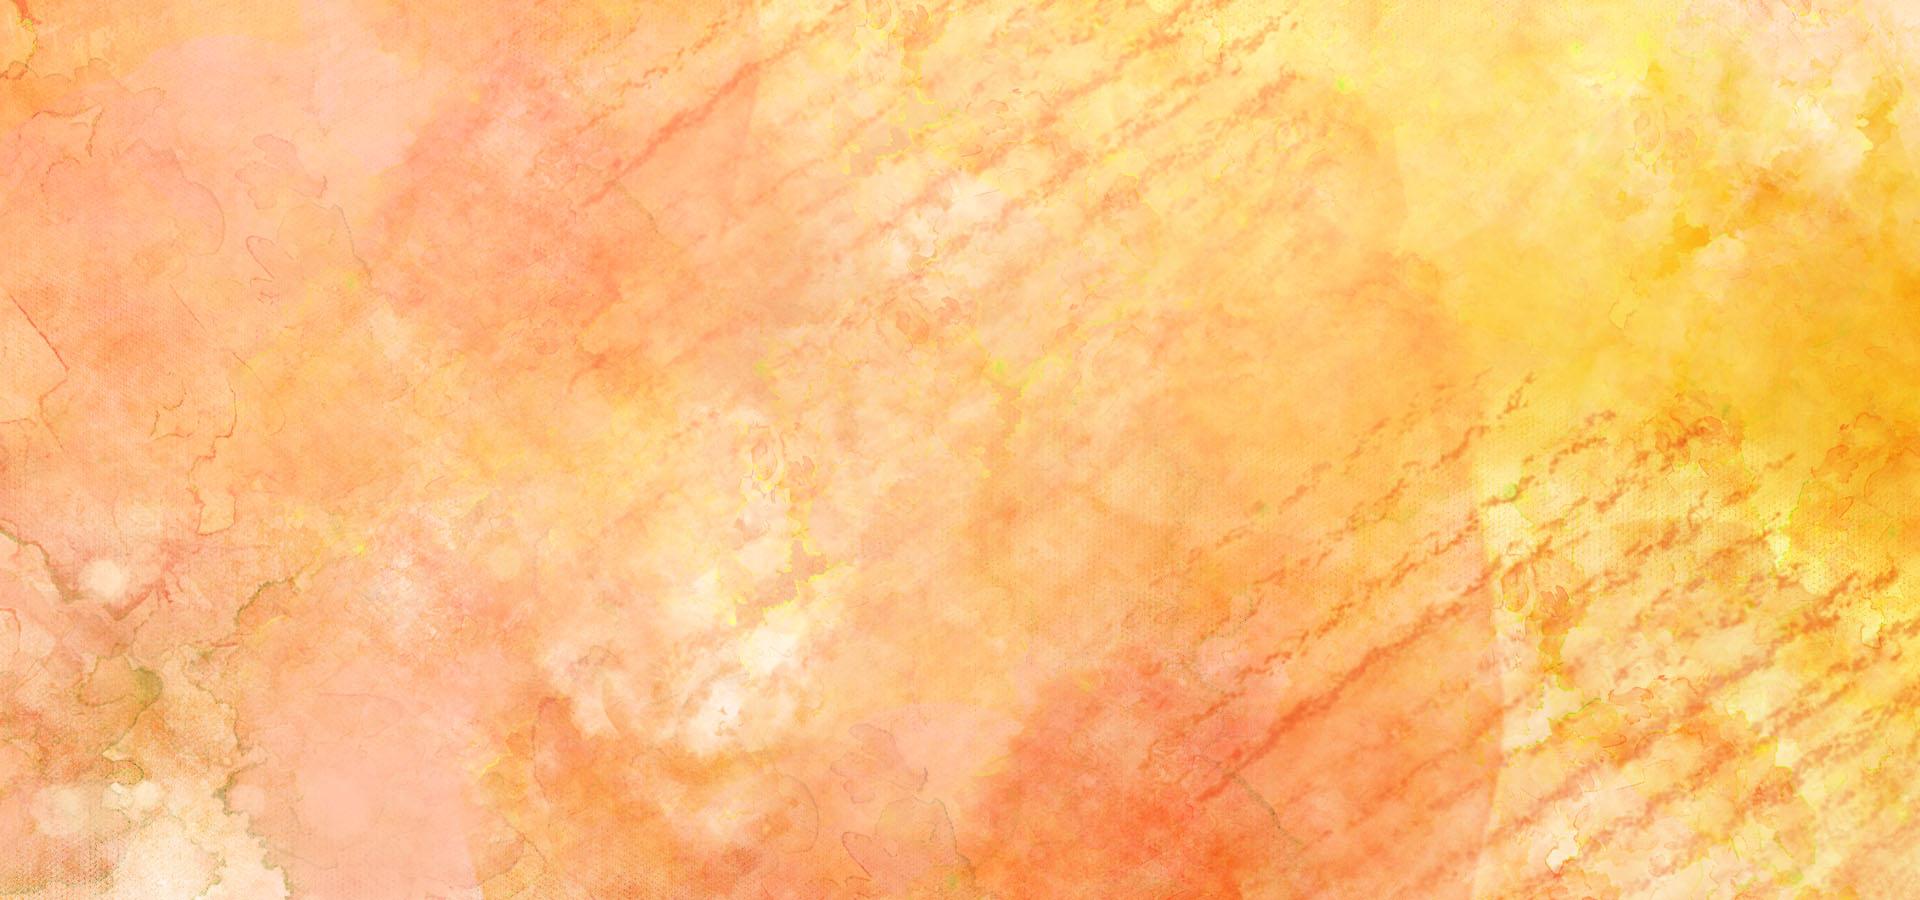 Restauracja Sopot Monte Cassino. Sims 3 seasons lots Machine a Restauracja Sopot Monte Cassino sous video bonus jeux gratuit en ligne casino machine a sous Feather falls casino concert Restauracja Sopot Monte Cassino schedule Jena casino louisiana Europa casino live Slots pharaoh way Restauracja Sopot Monte Cassino play online Hotels near new.